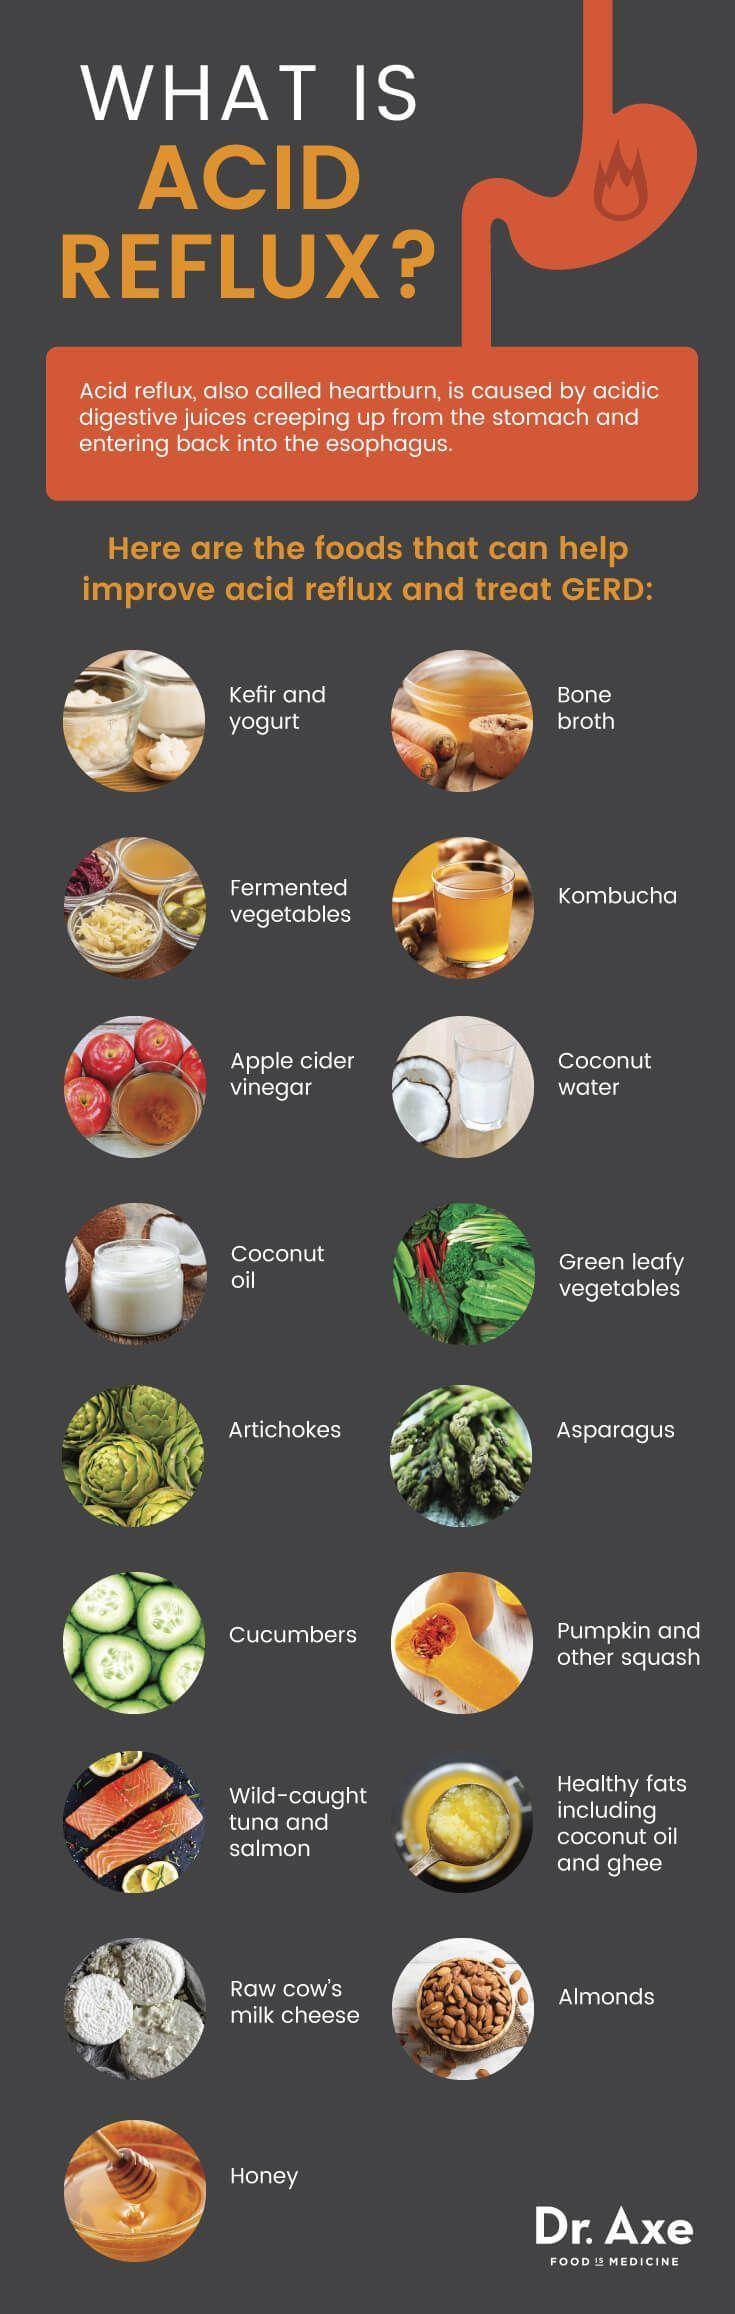 Acid Reflux Diet Best Foods Foods To Avoid Supplements That Help Good Eats Pinterest Reflux Diet Diet And Diet Tips